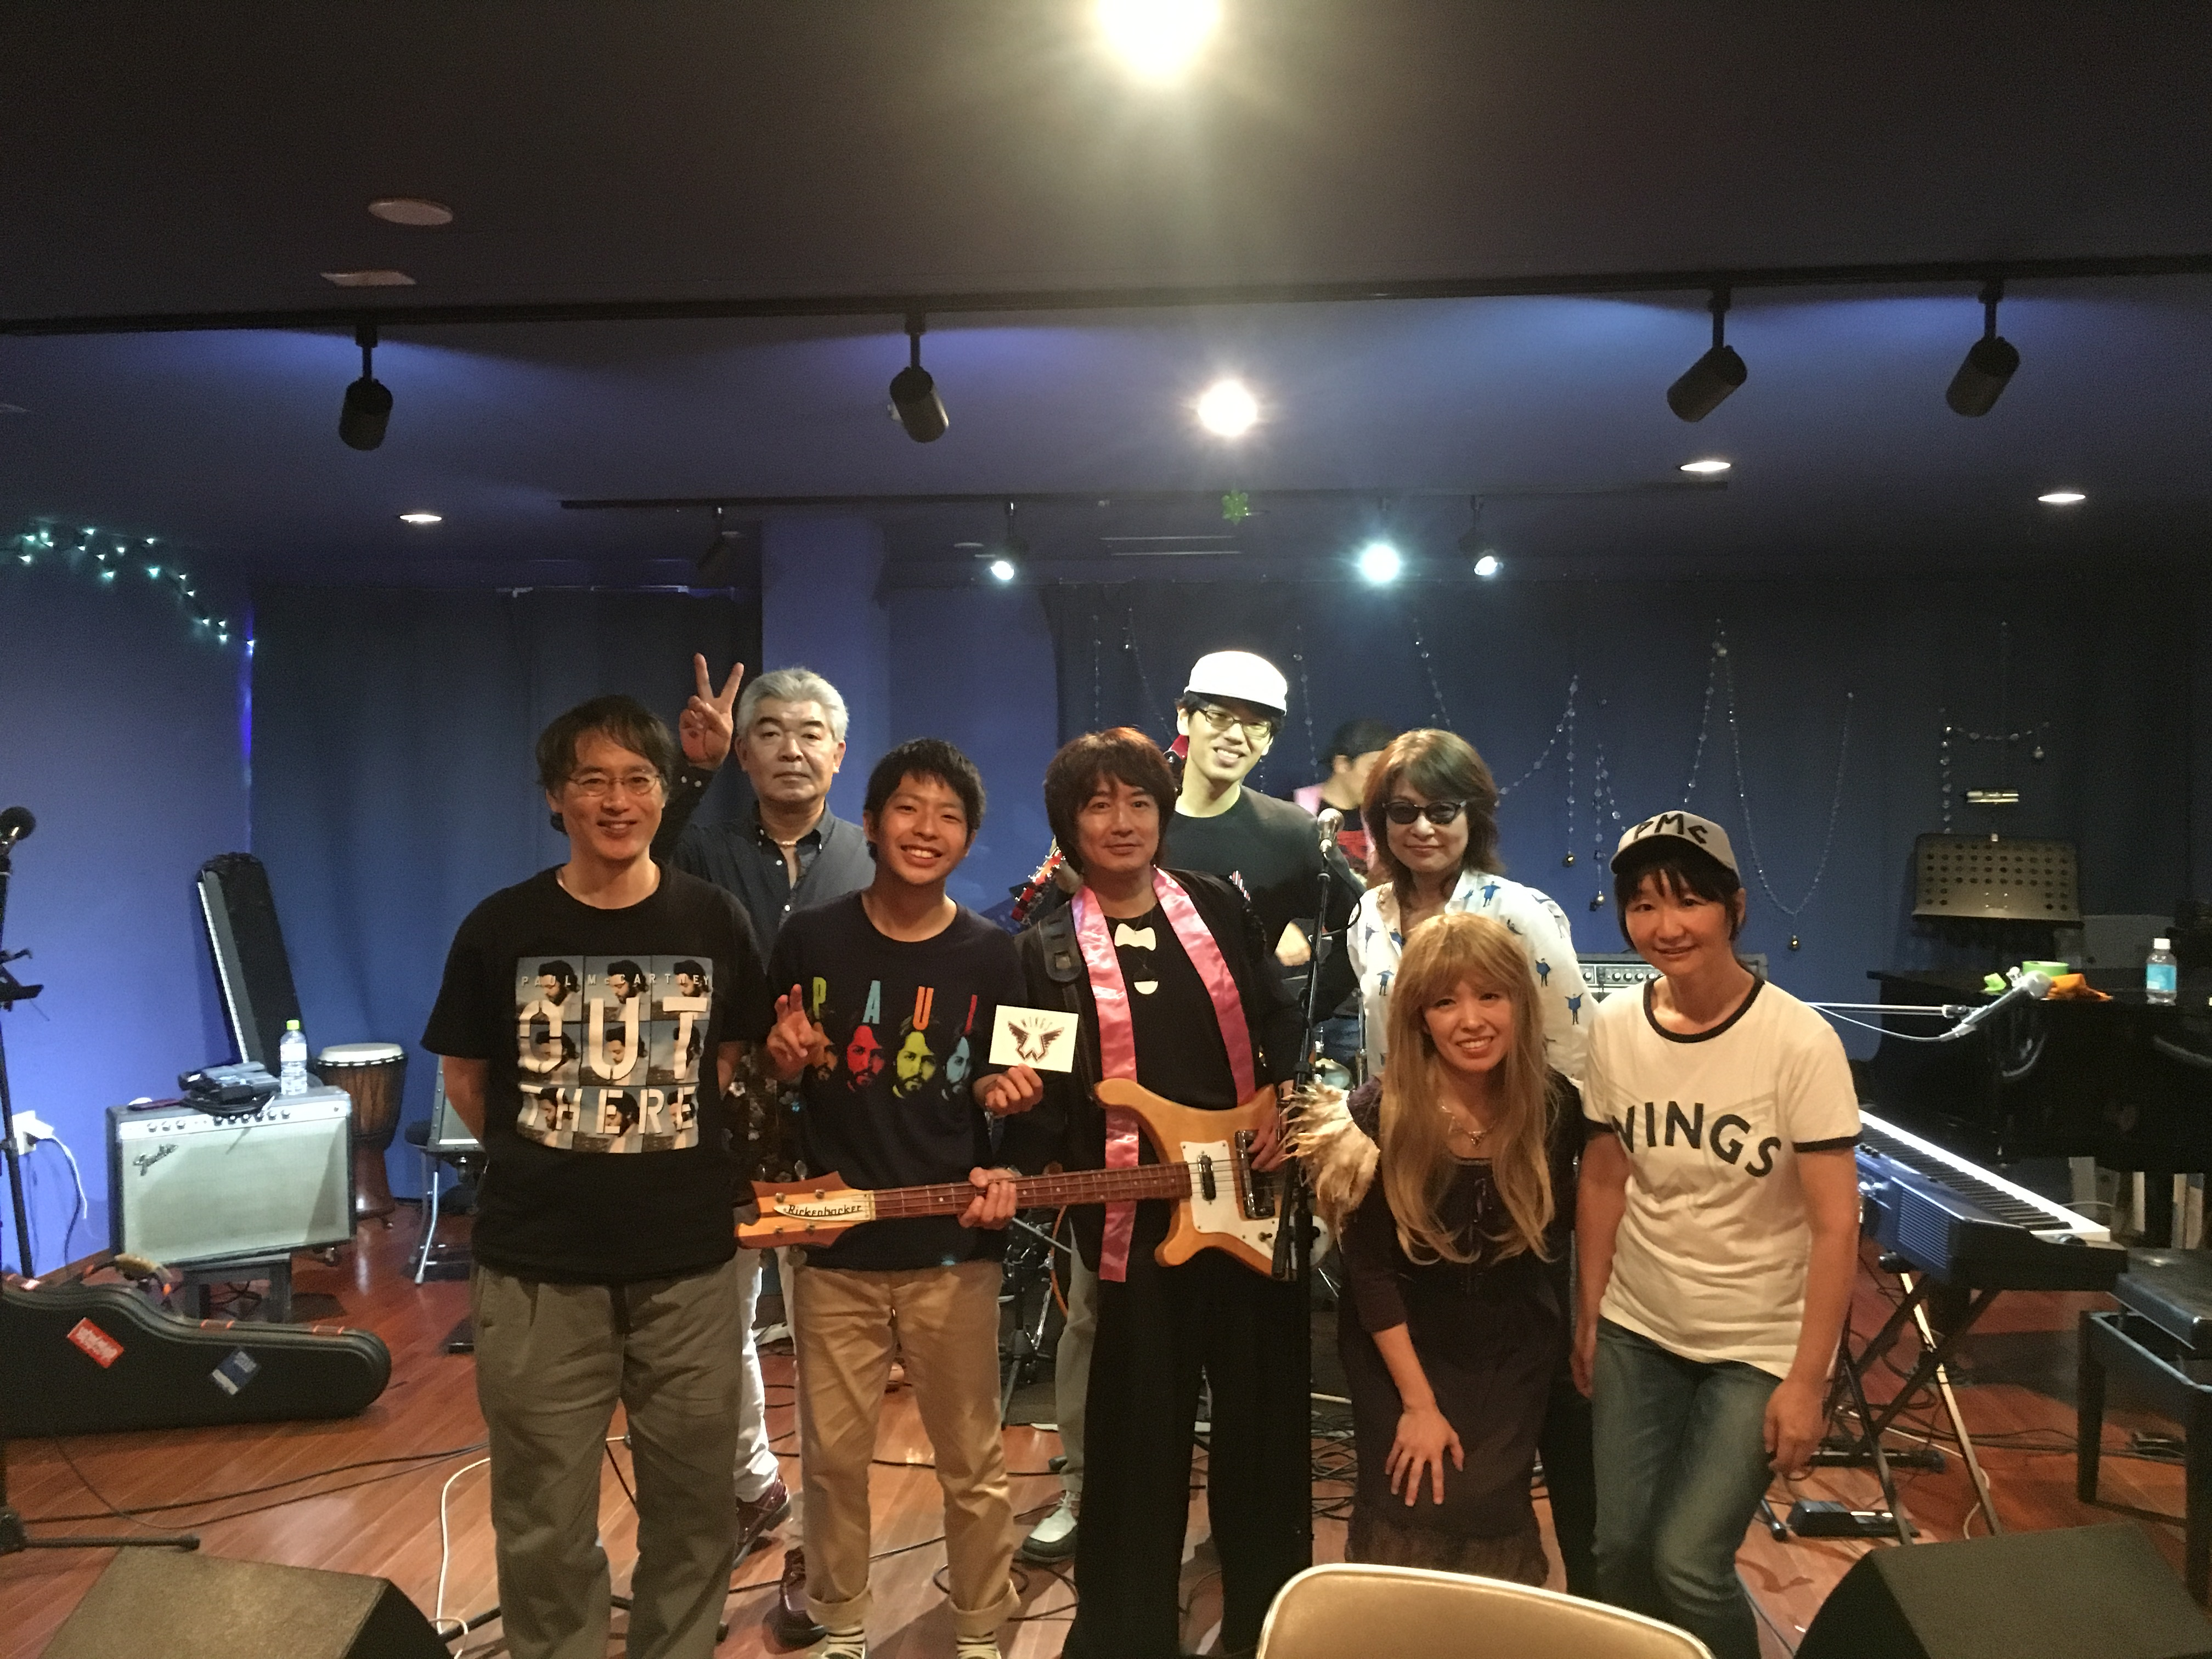 2016 7/23 PAULソーセージ&Winナース FUKUOKA TOUR